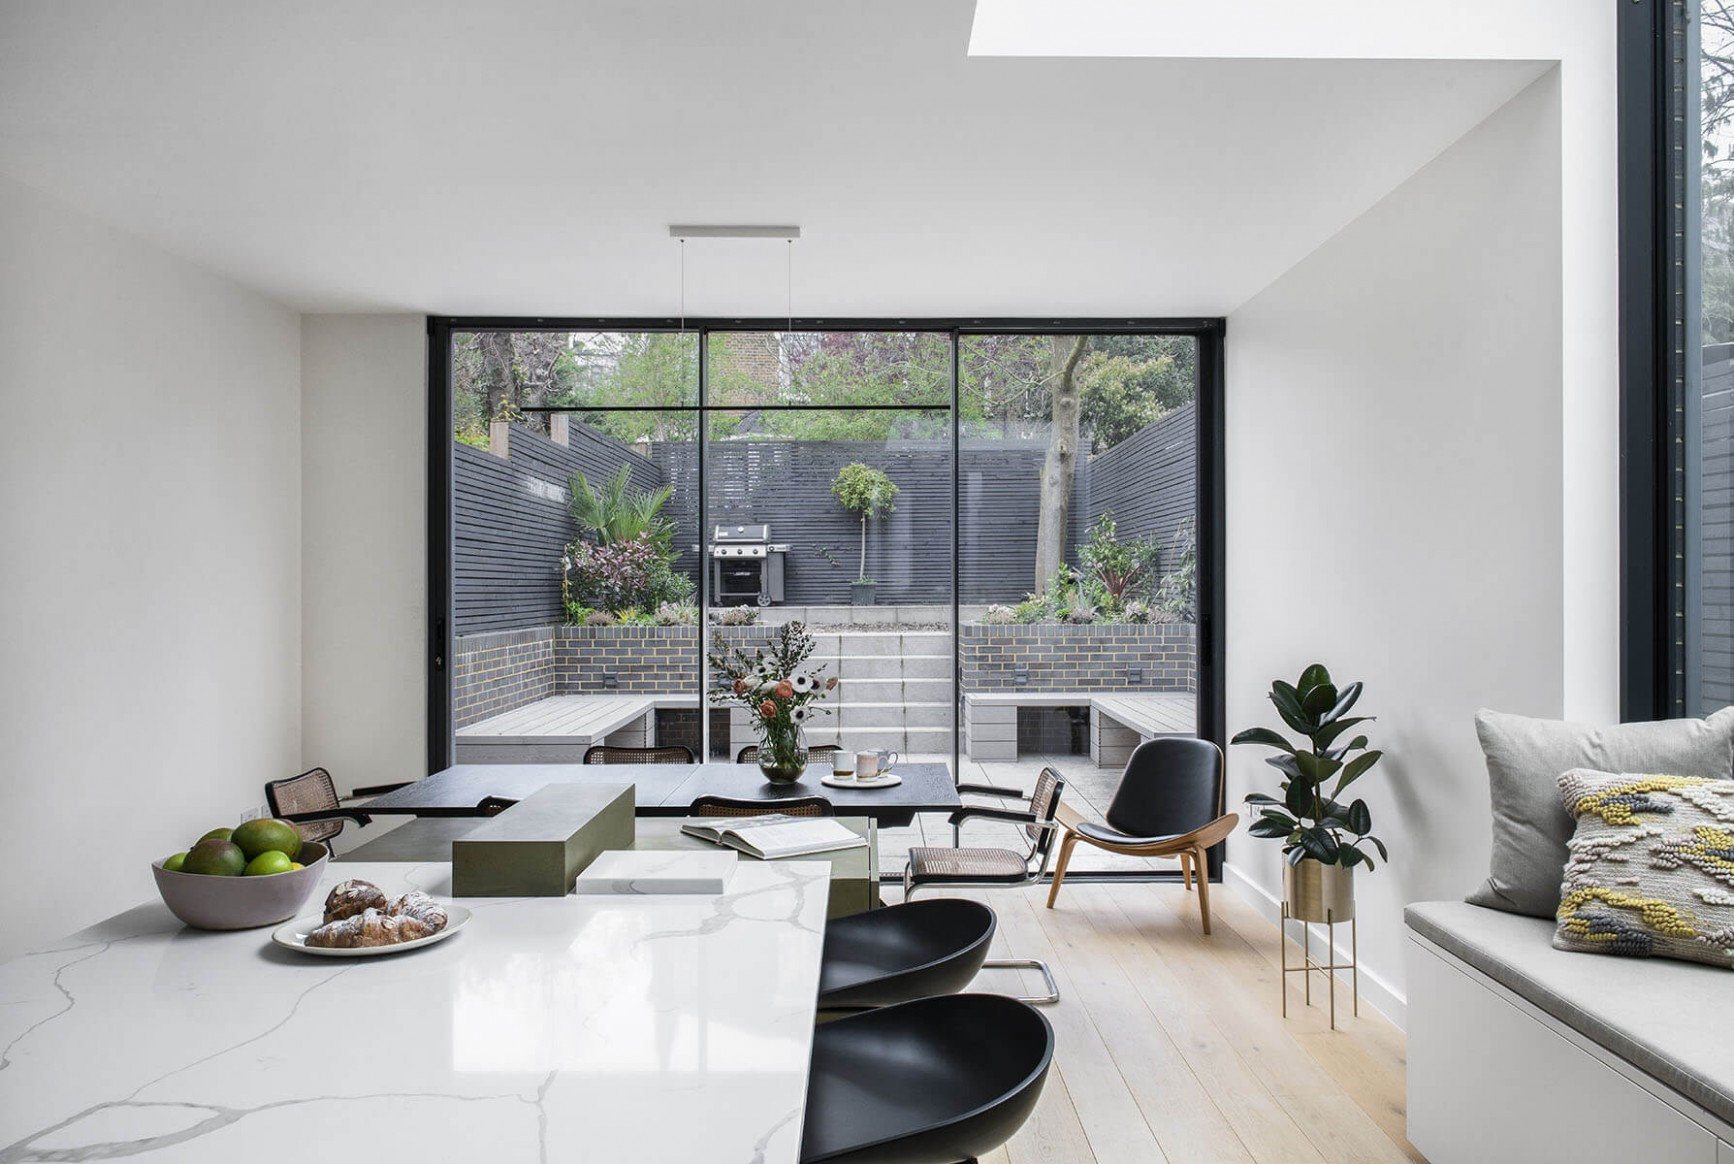 Interior Design London Studio  Commercial & Residential - Apartment Design Guide Uk